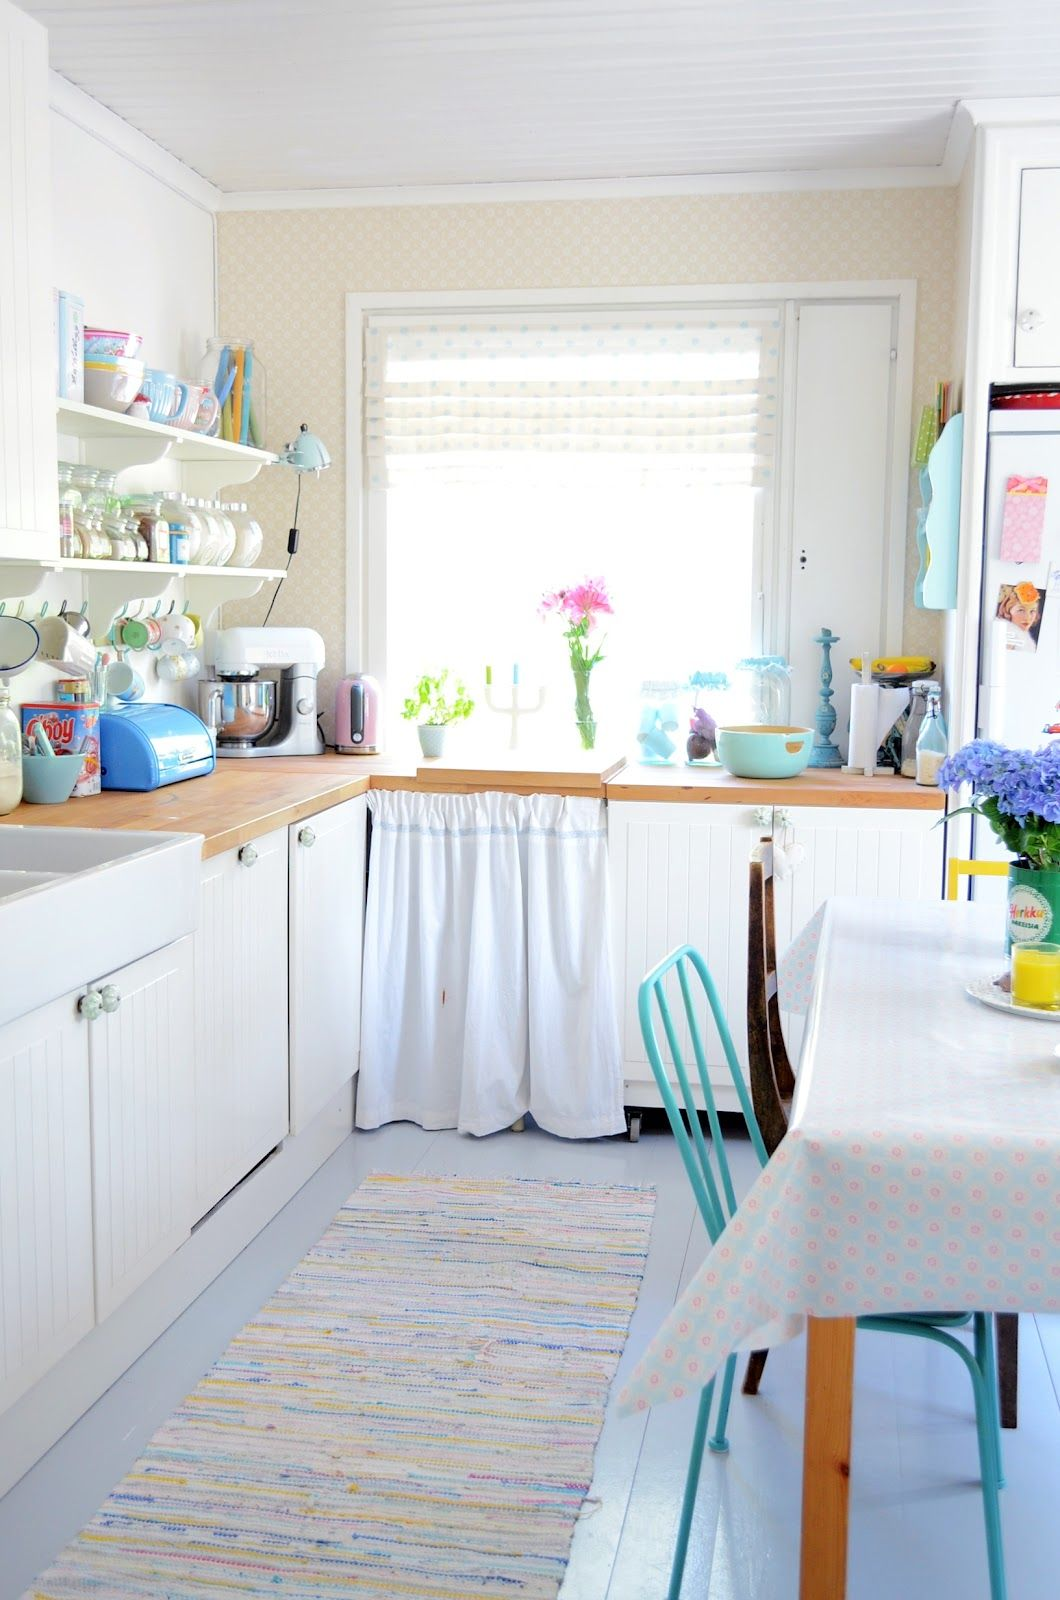 http://anrinko.blogspot.fr/2012/05/keittiossa.html?utm_source=feedburner_medium=feed_campaign=Feed:+PrinsessaAuto+(Prinsessa+%26amp;+Auto)  white kitchen - retro - vintage